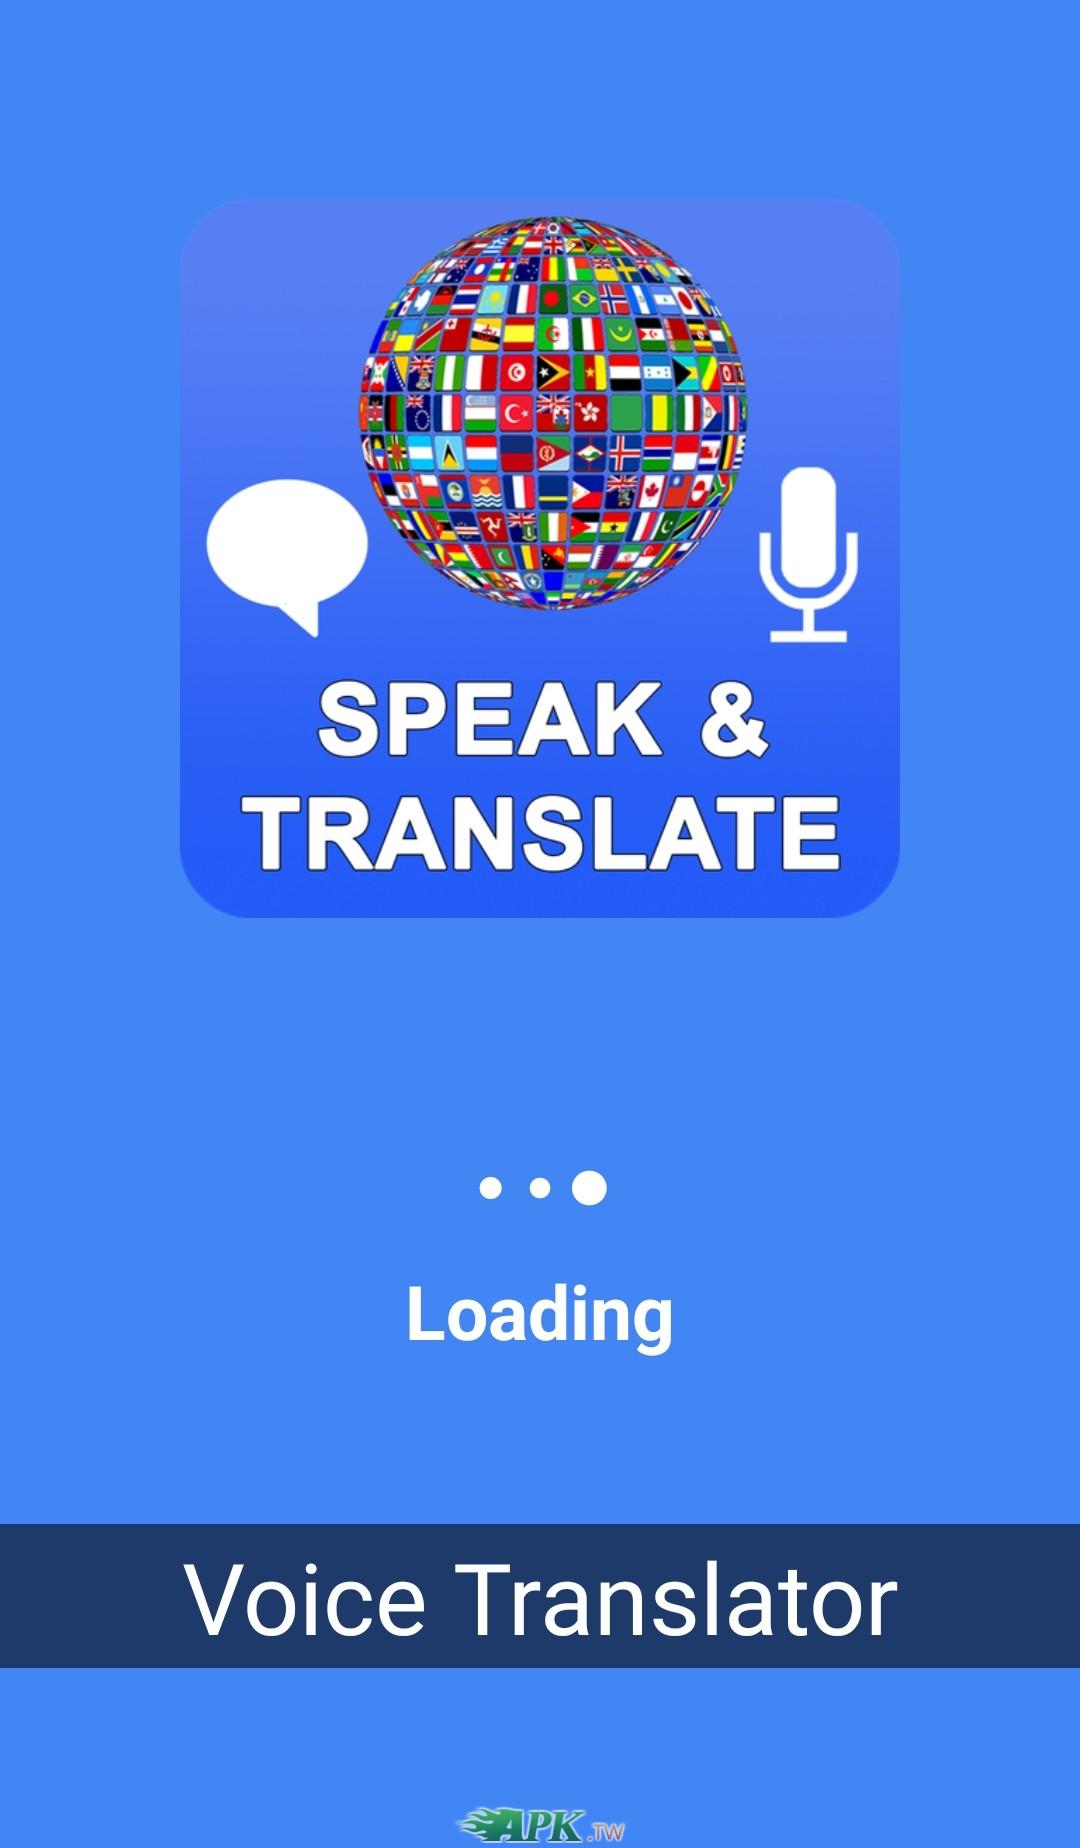 Speak&Translate_2.6_1.jpg